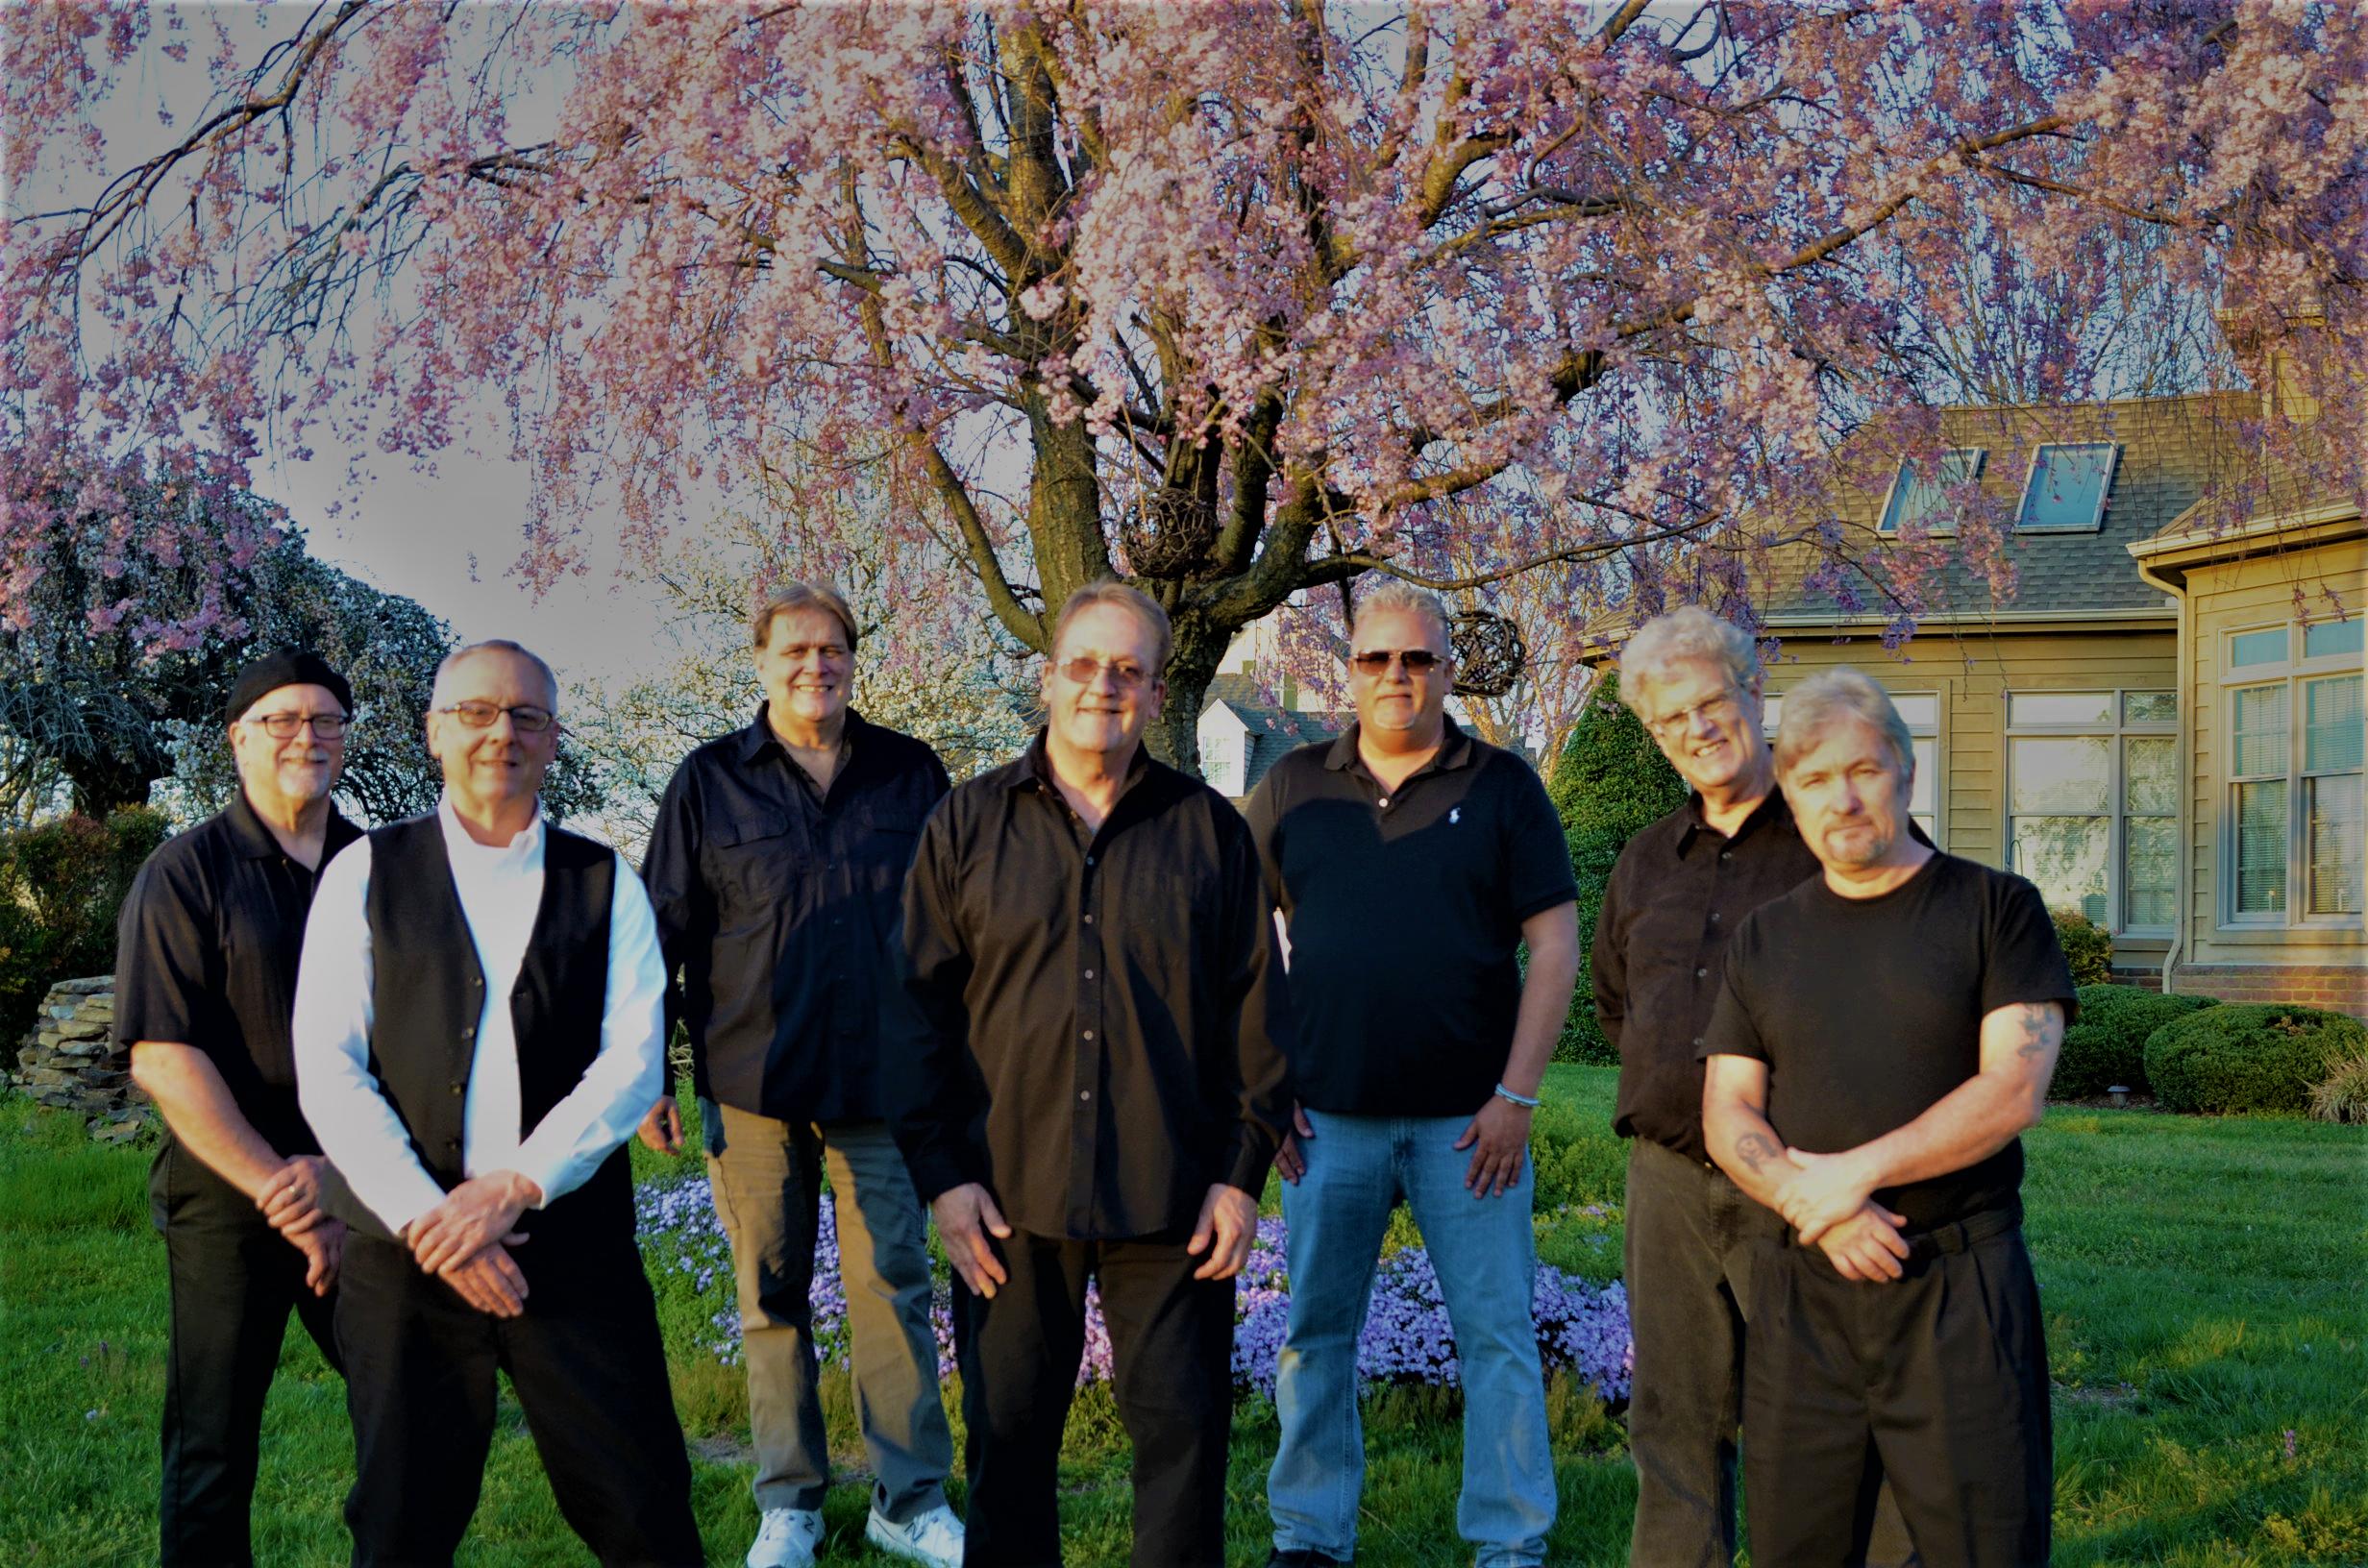 Reunion Band